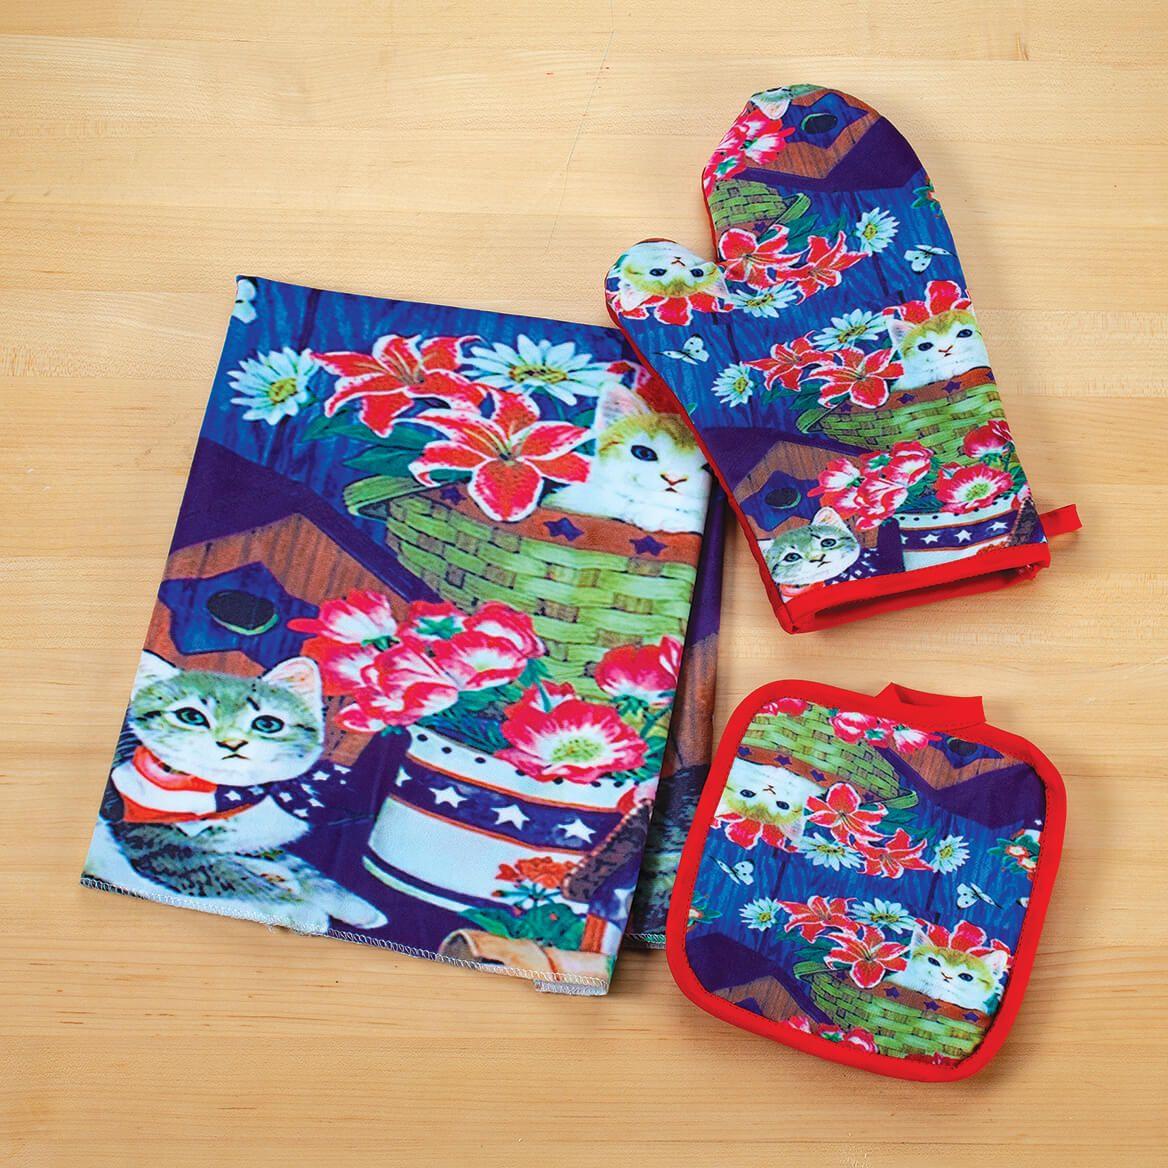 Kitten Patriotic Towel, Oven Mitt & Pot Holder Set-371629